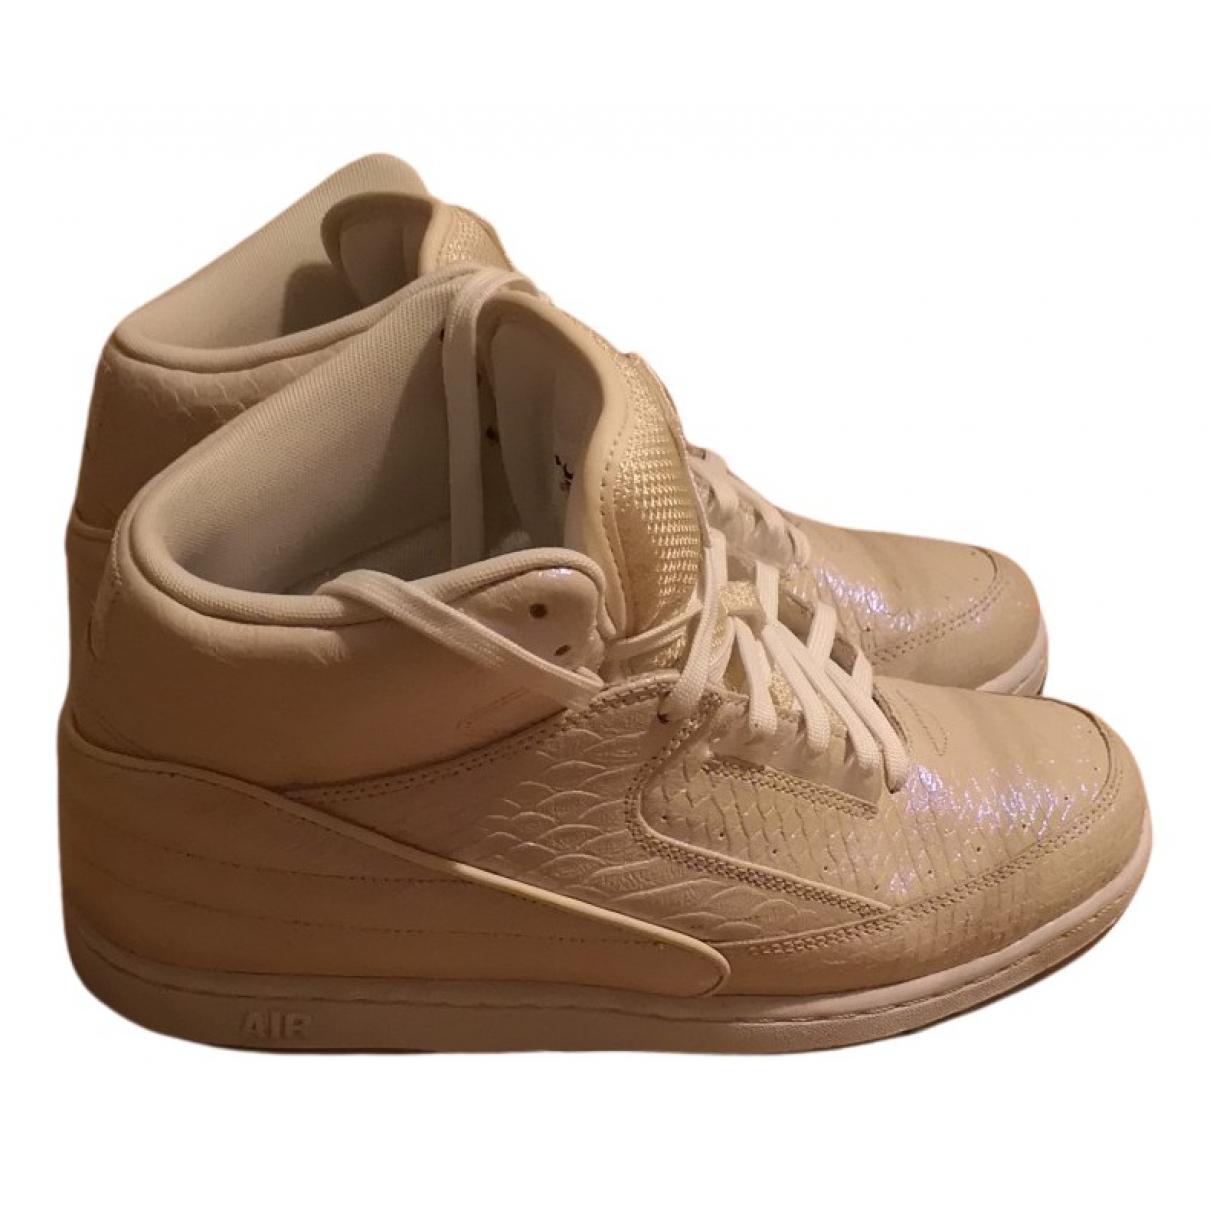 Nike - Baskets   pour homme en python - beige